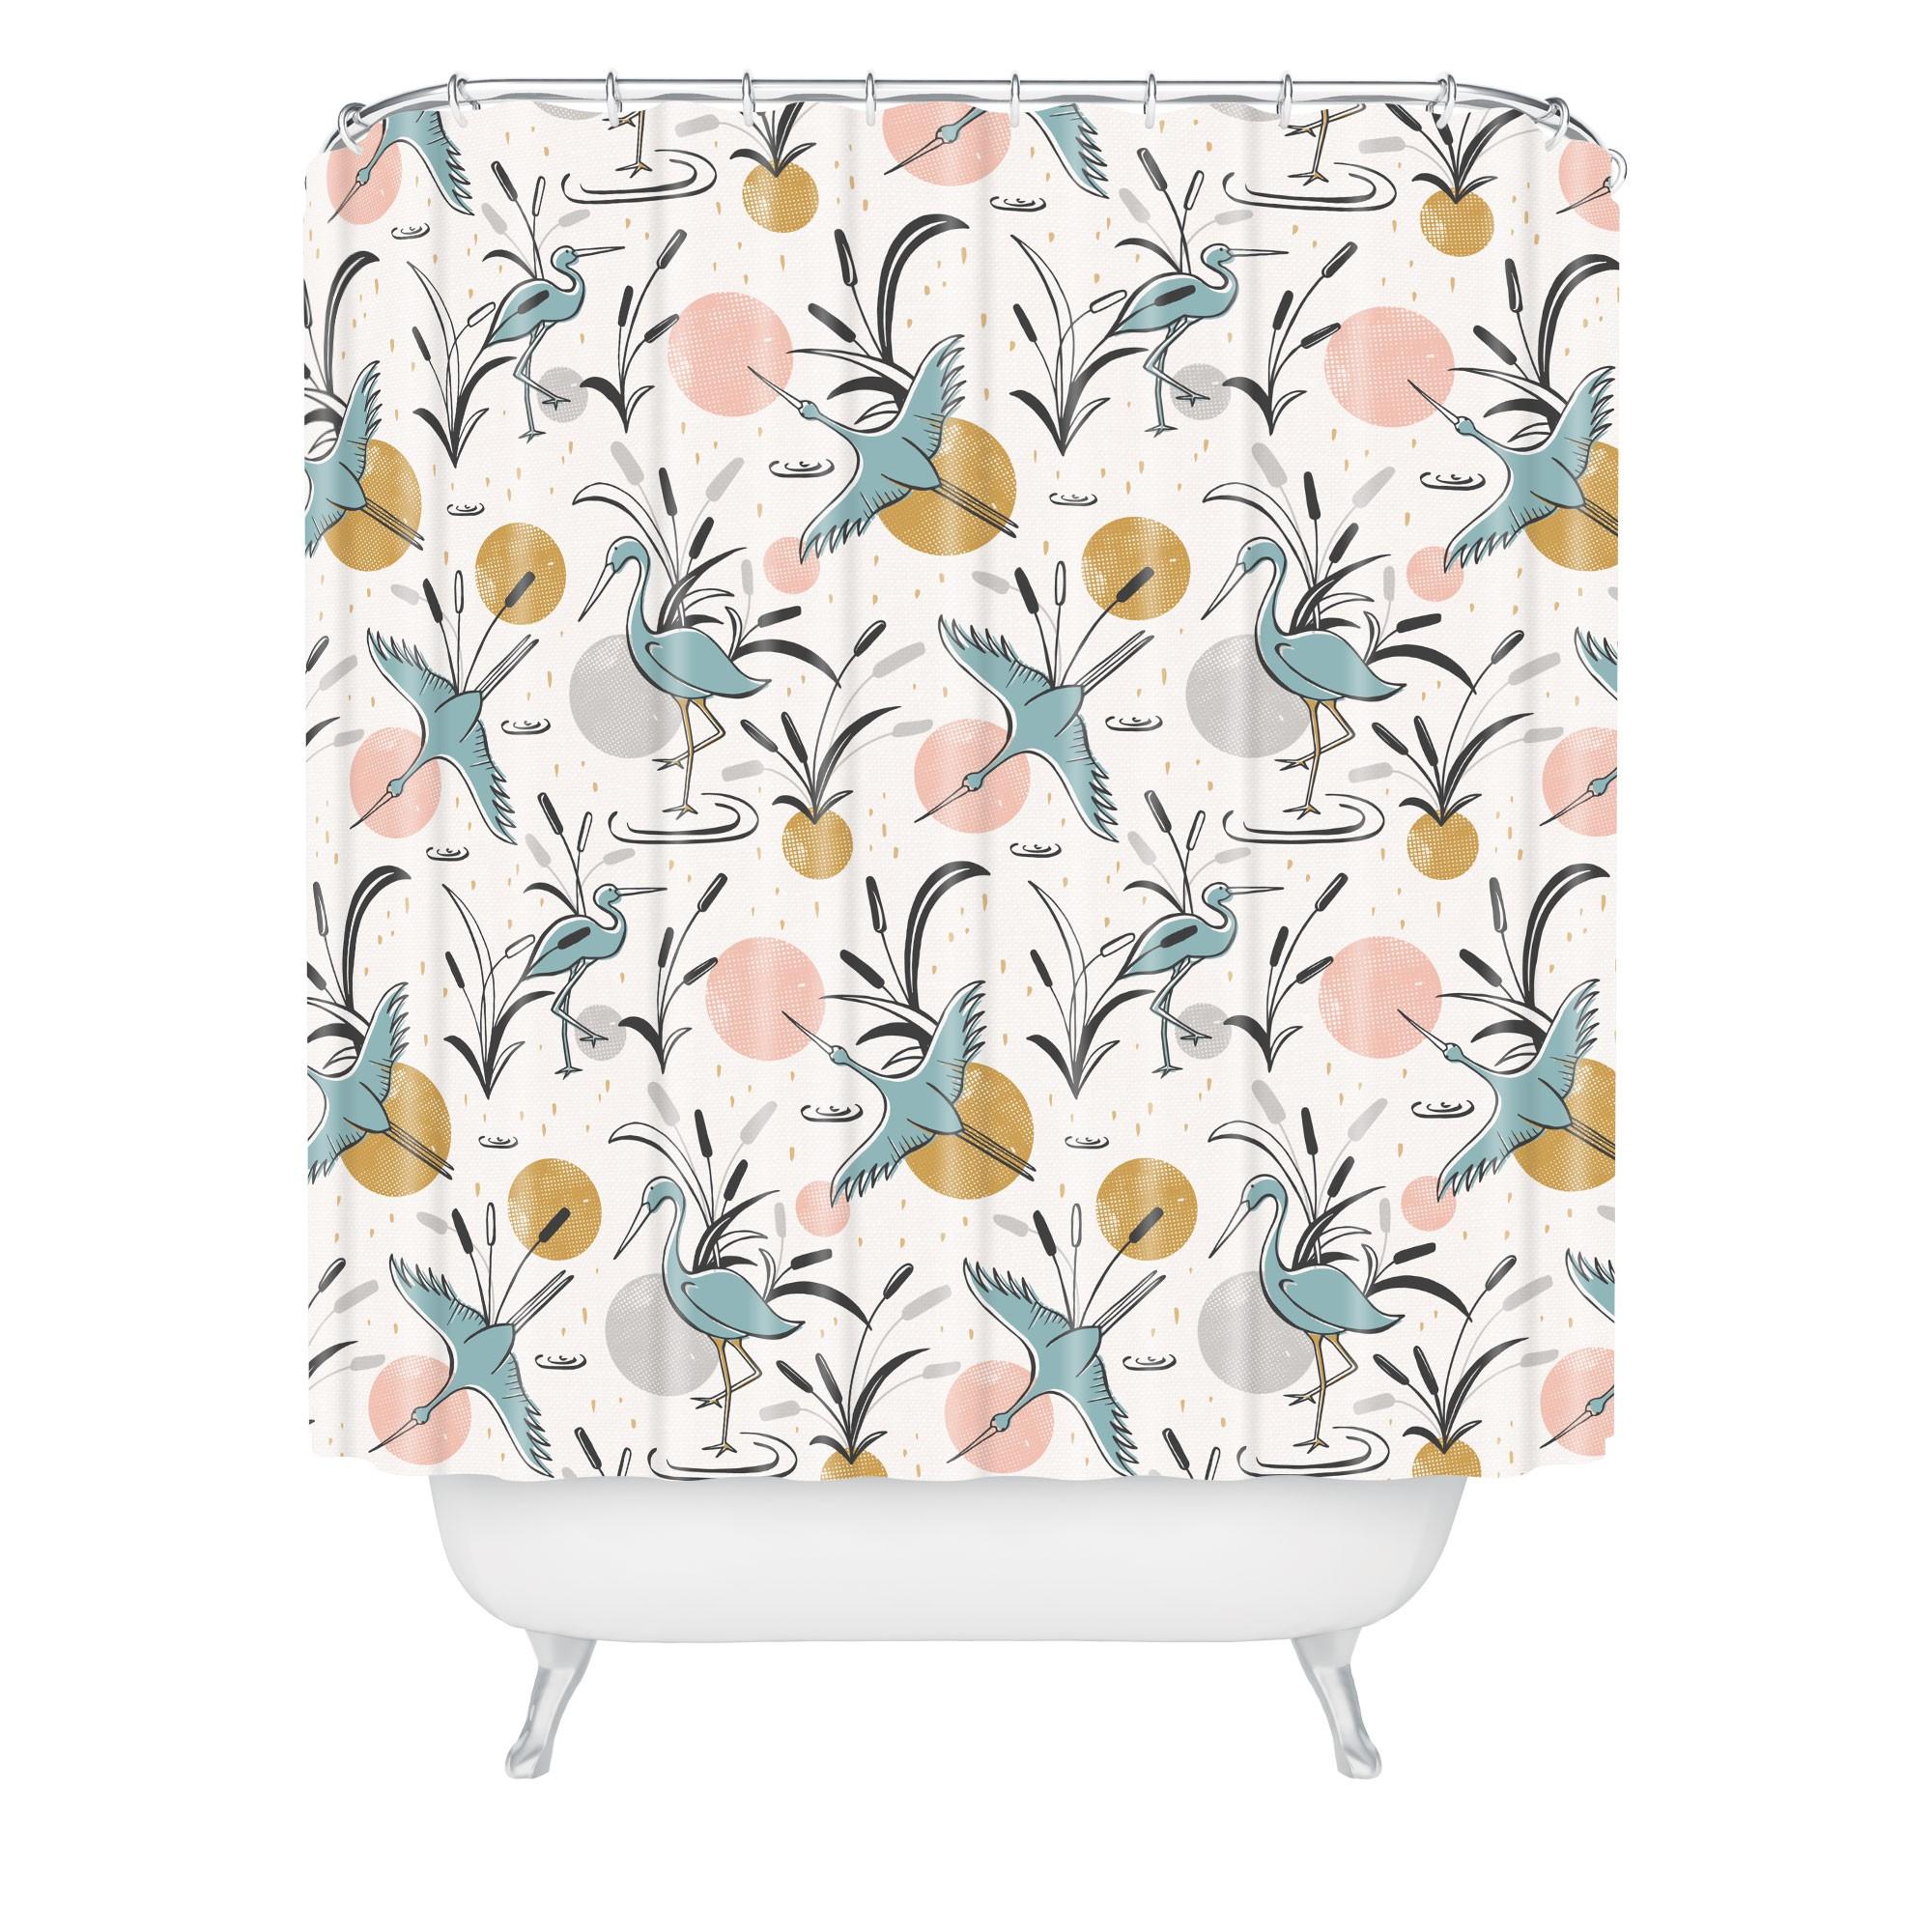 Marshland Shower Curtain Pink - Deny Designs